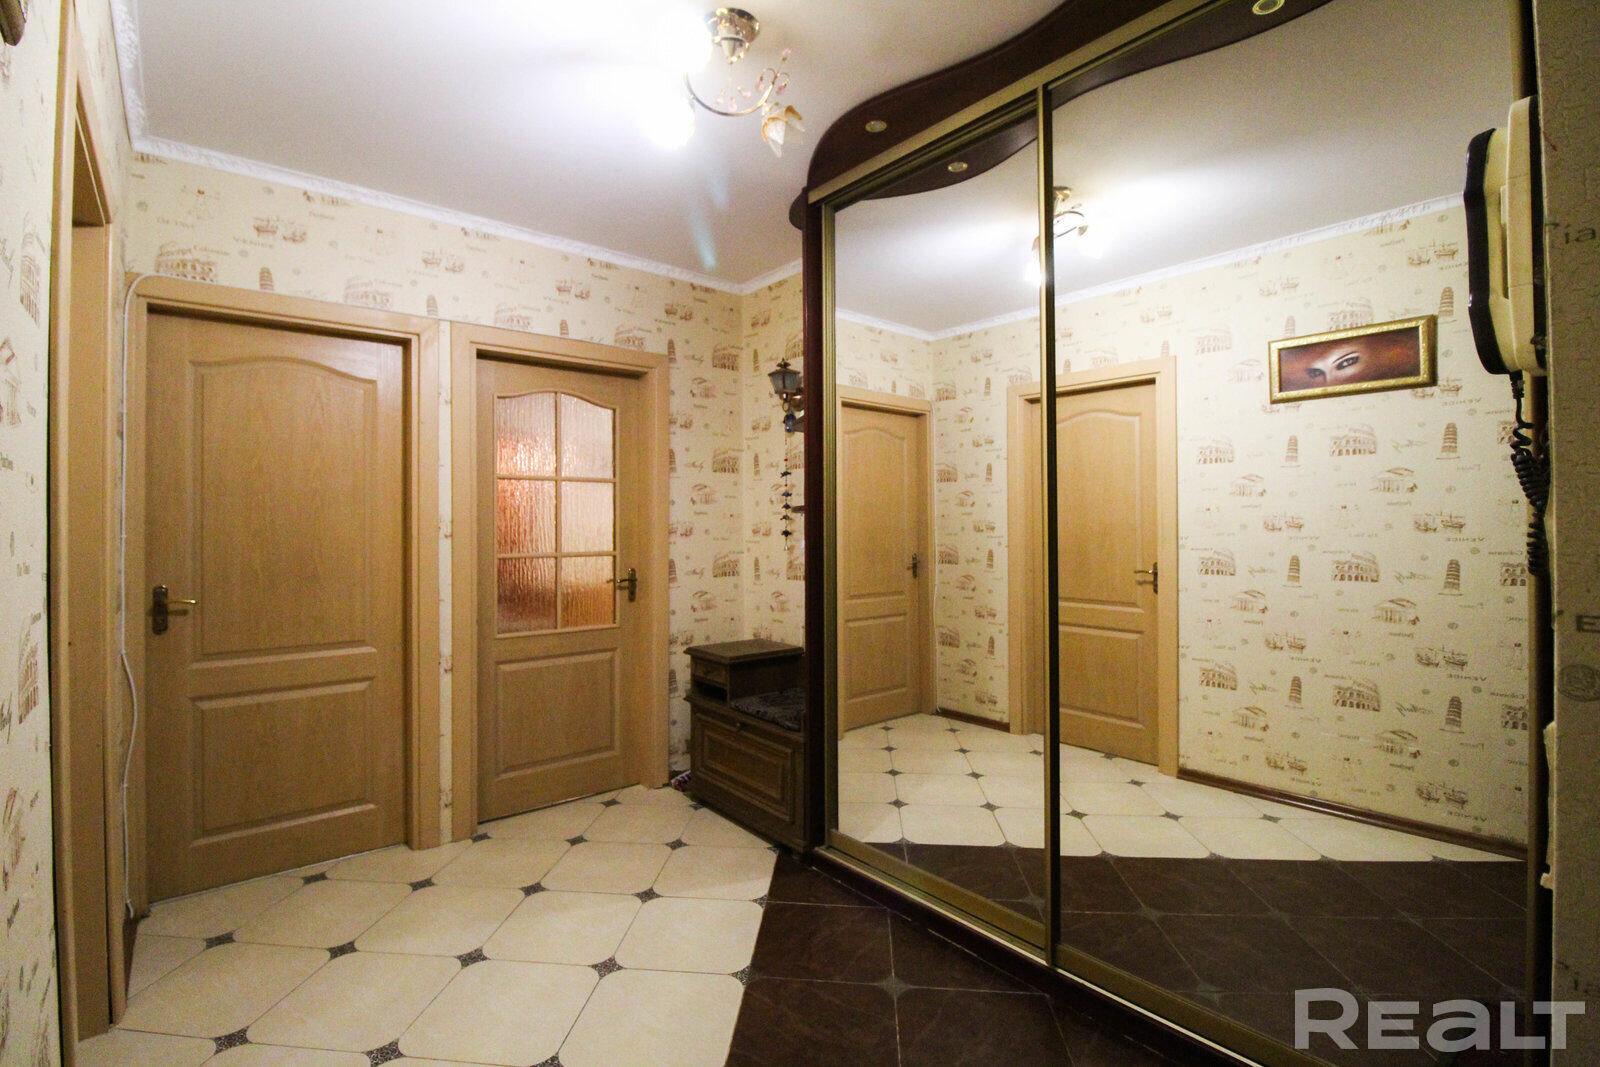 Продается 4-х комнатная квартира, ул. Лынькова д.15-В - фото №6